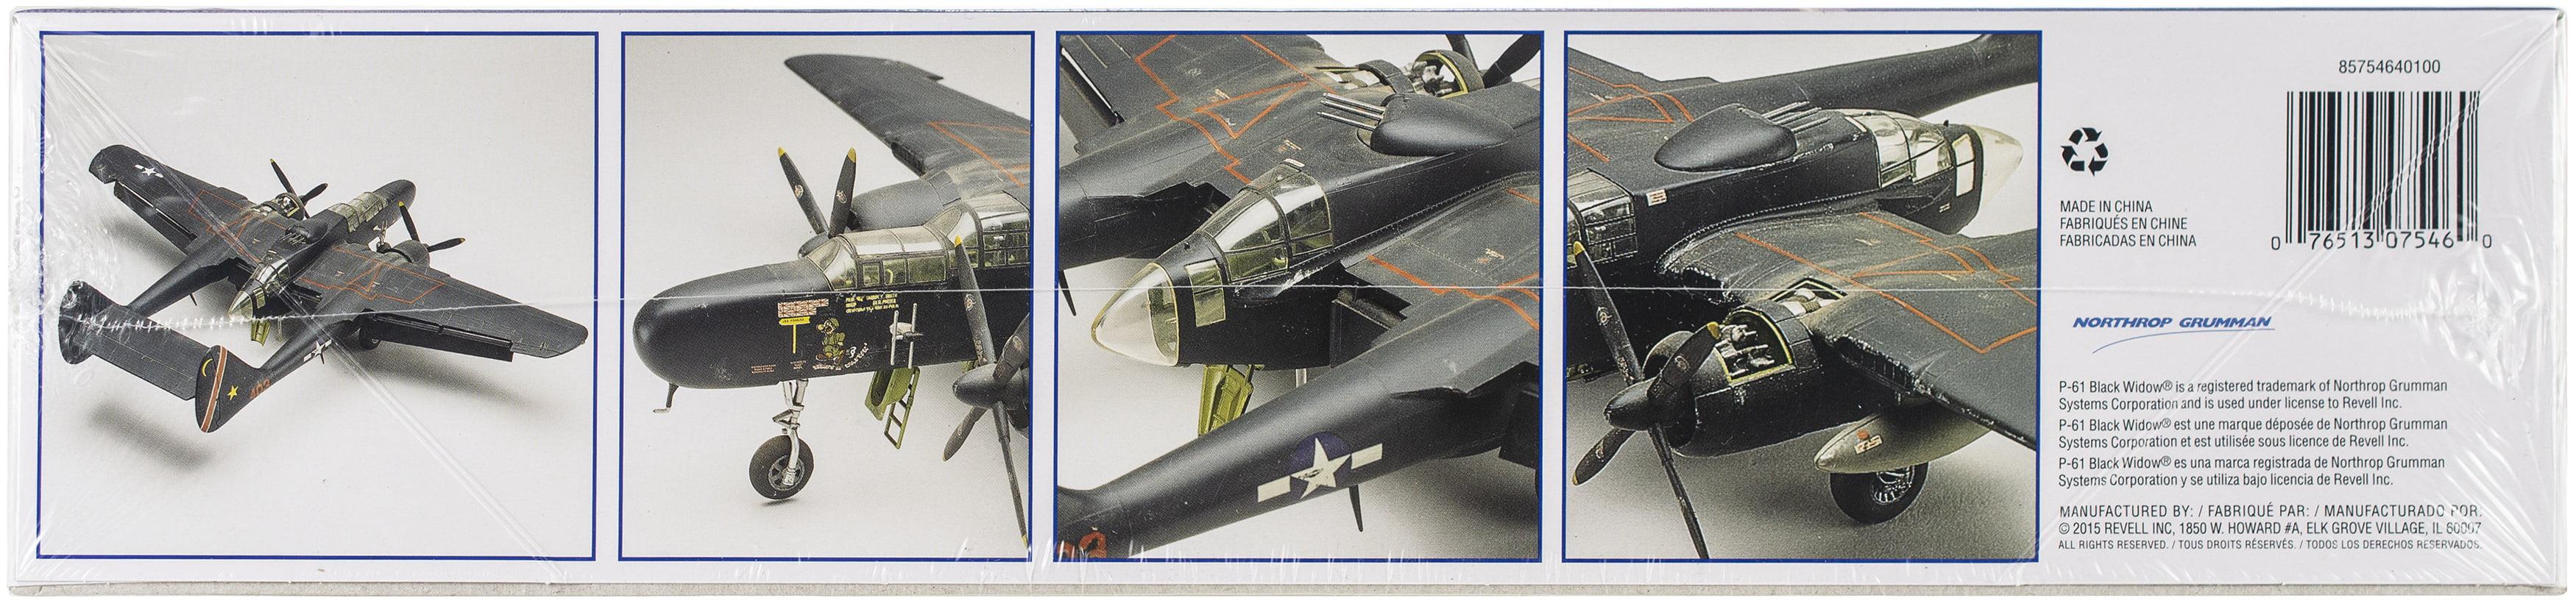 Plastic Model Kit P-61 Black Wicow 1:48 076513075460